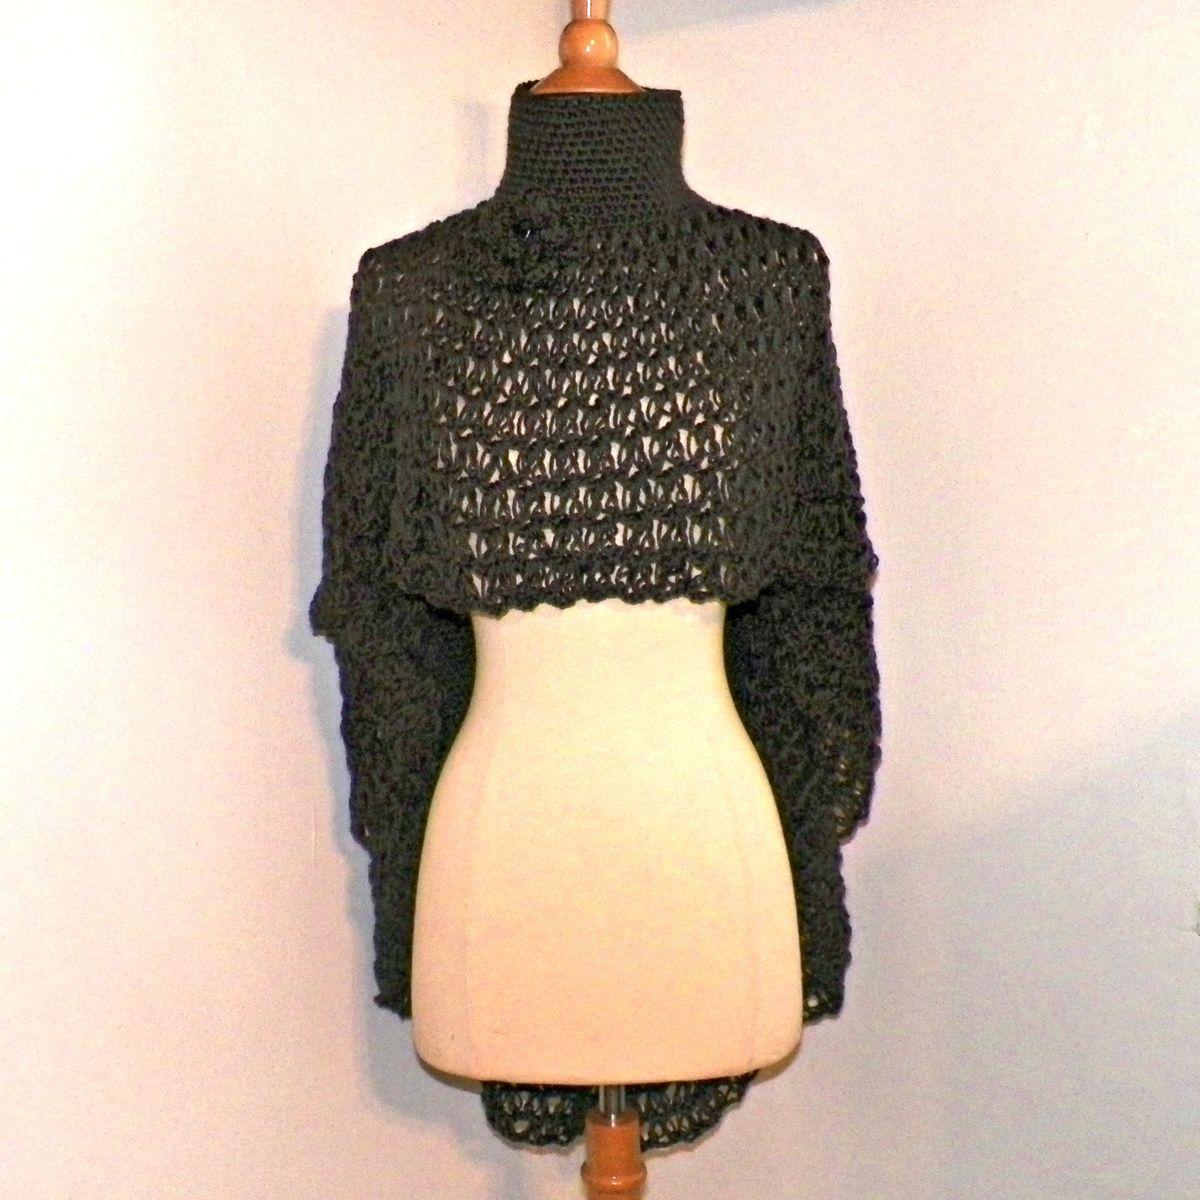 Knitting Pattern Turtleneck Capelet : Poncho Cowl Turtle Neck Boho Cape Gray Shawl Long Capelet Crochet Dark Gray K...